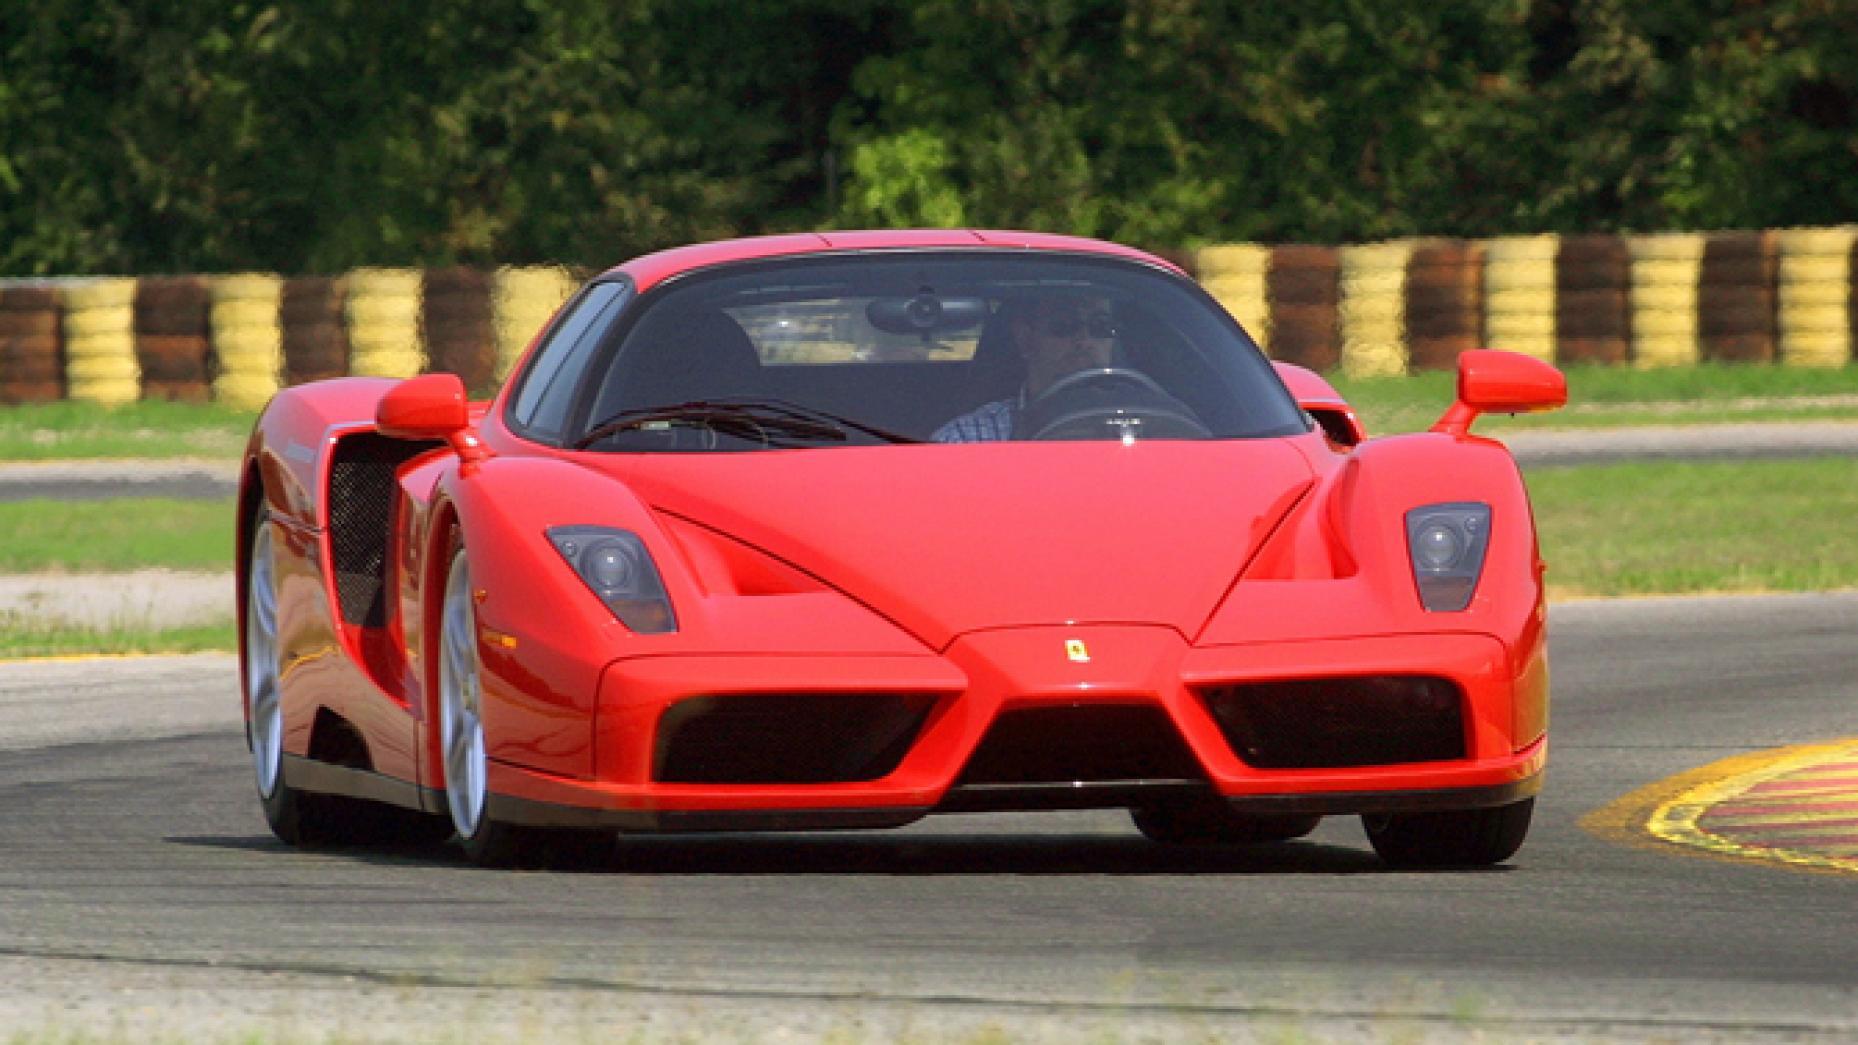 Ferrari Enzo: 1m 24.9s